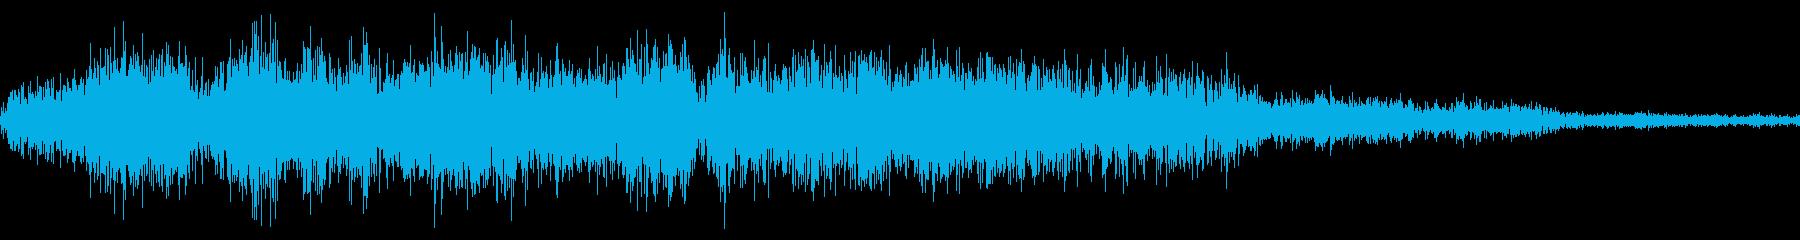 RPG:風魔法音「シュバババー」の再生済みの波形